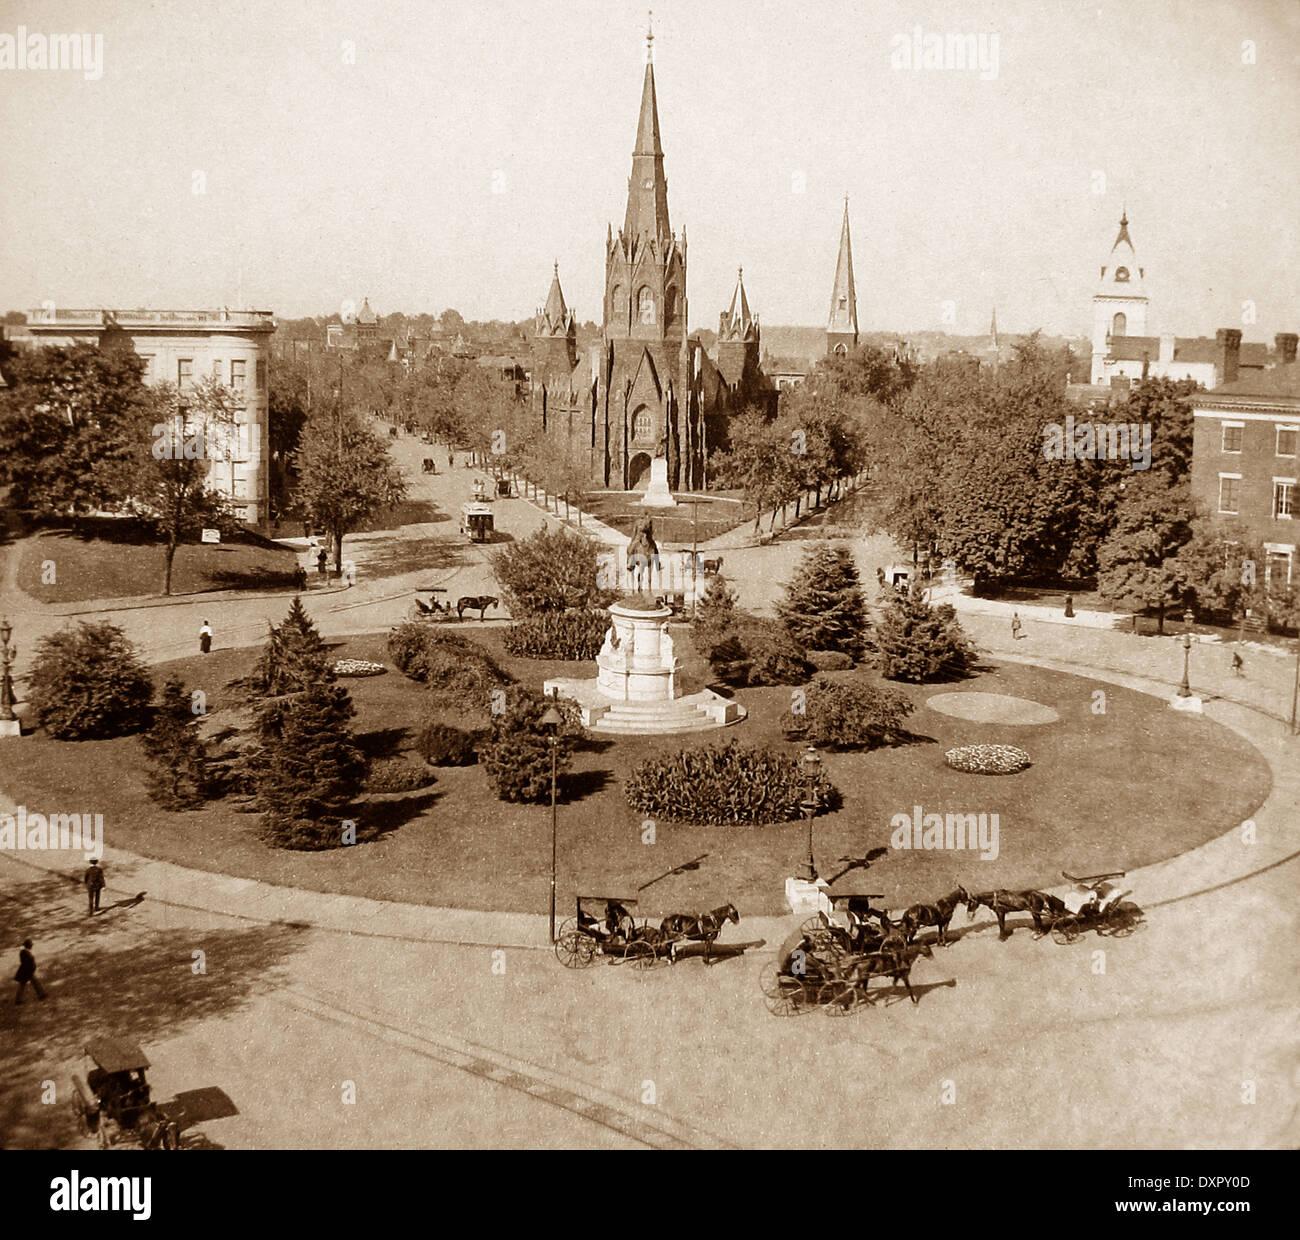 Fourteenth Street Circle Washington DC USA early 1900s - Stock Image